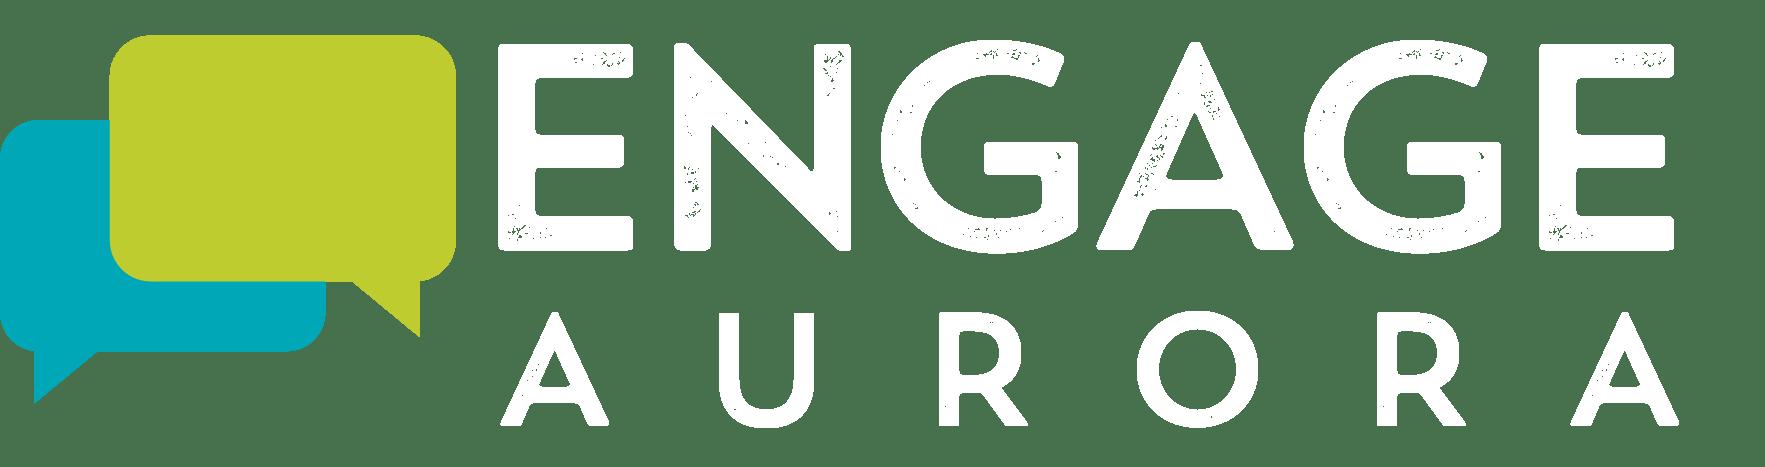 Engage Aurora